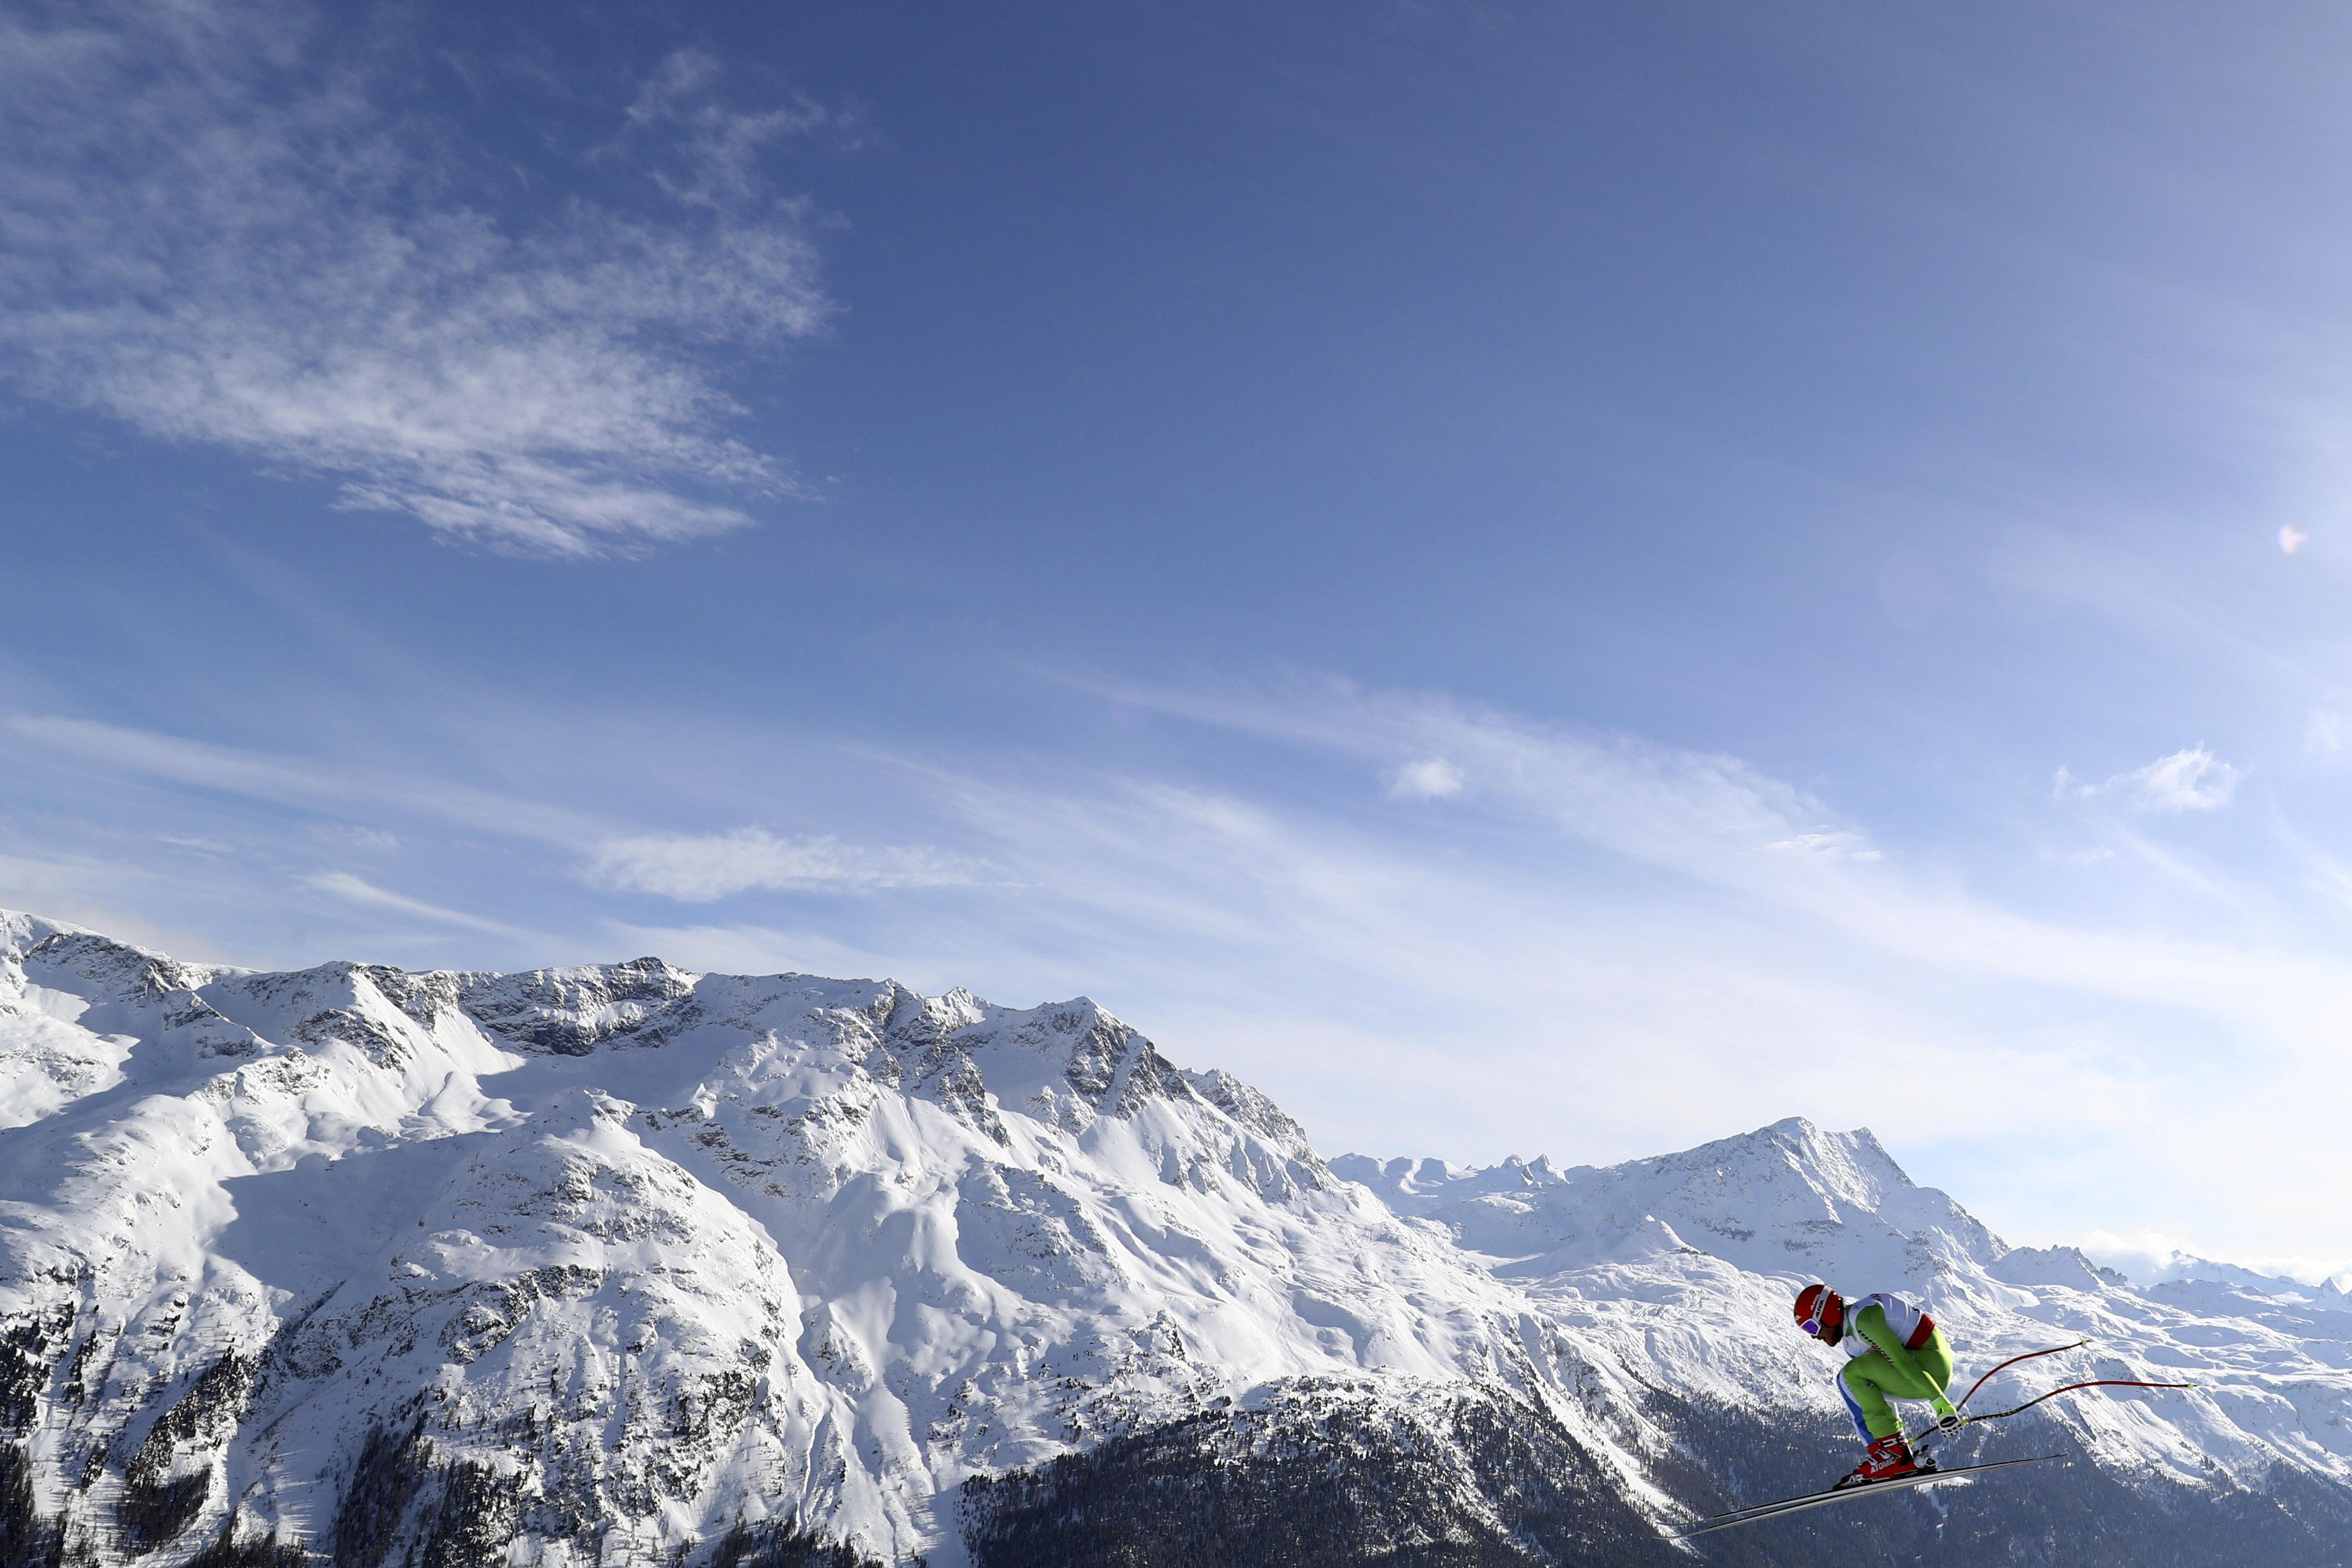 Slovenia's Miha Hrobat competes during a men's downhill race, at the alpine ski World Championships in St. Moritz, Switzerland, Sunday, Feb.12, 2017. (AP Photo/Alessandro Trovati)